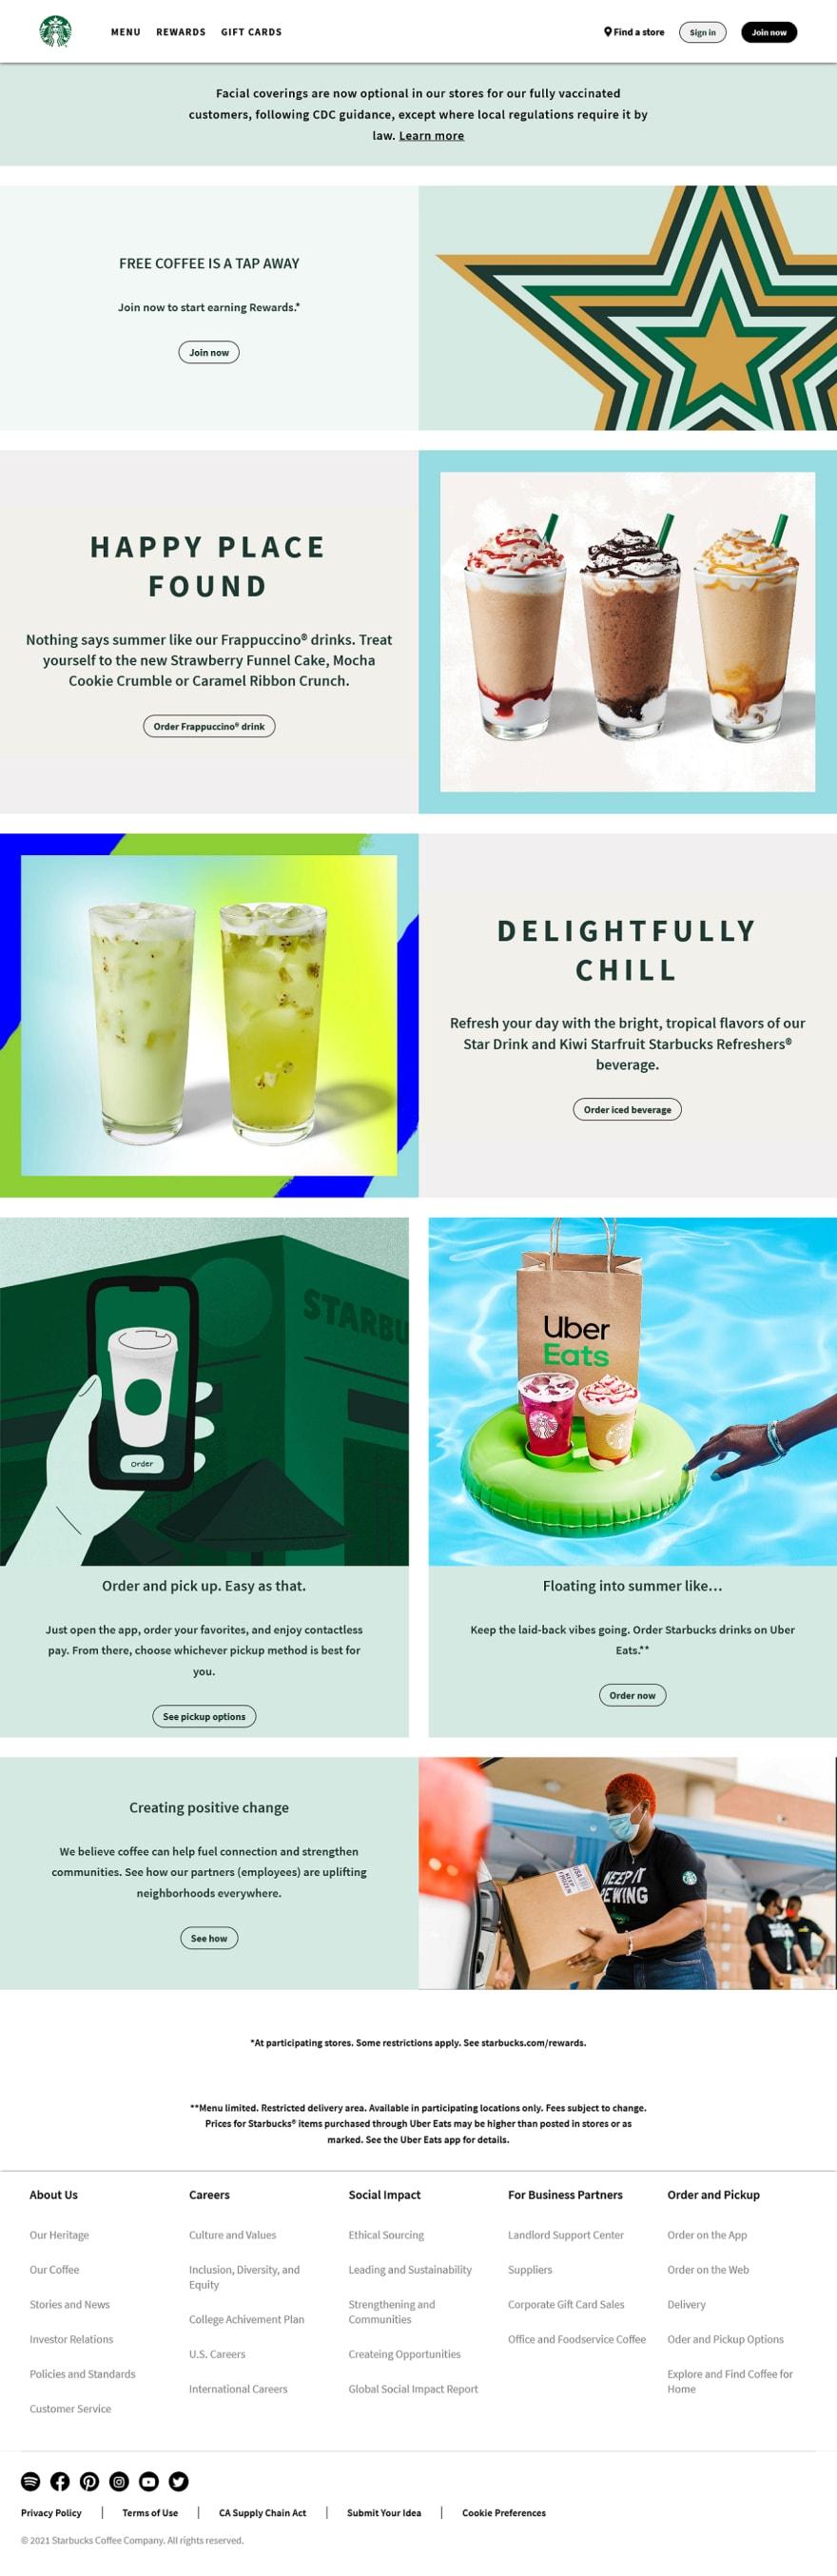 Starbucks-Coffee-Company-Clone